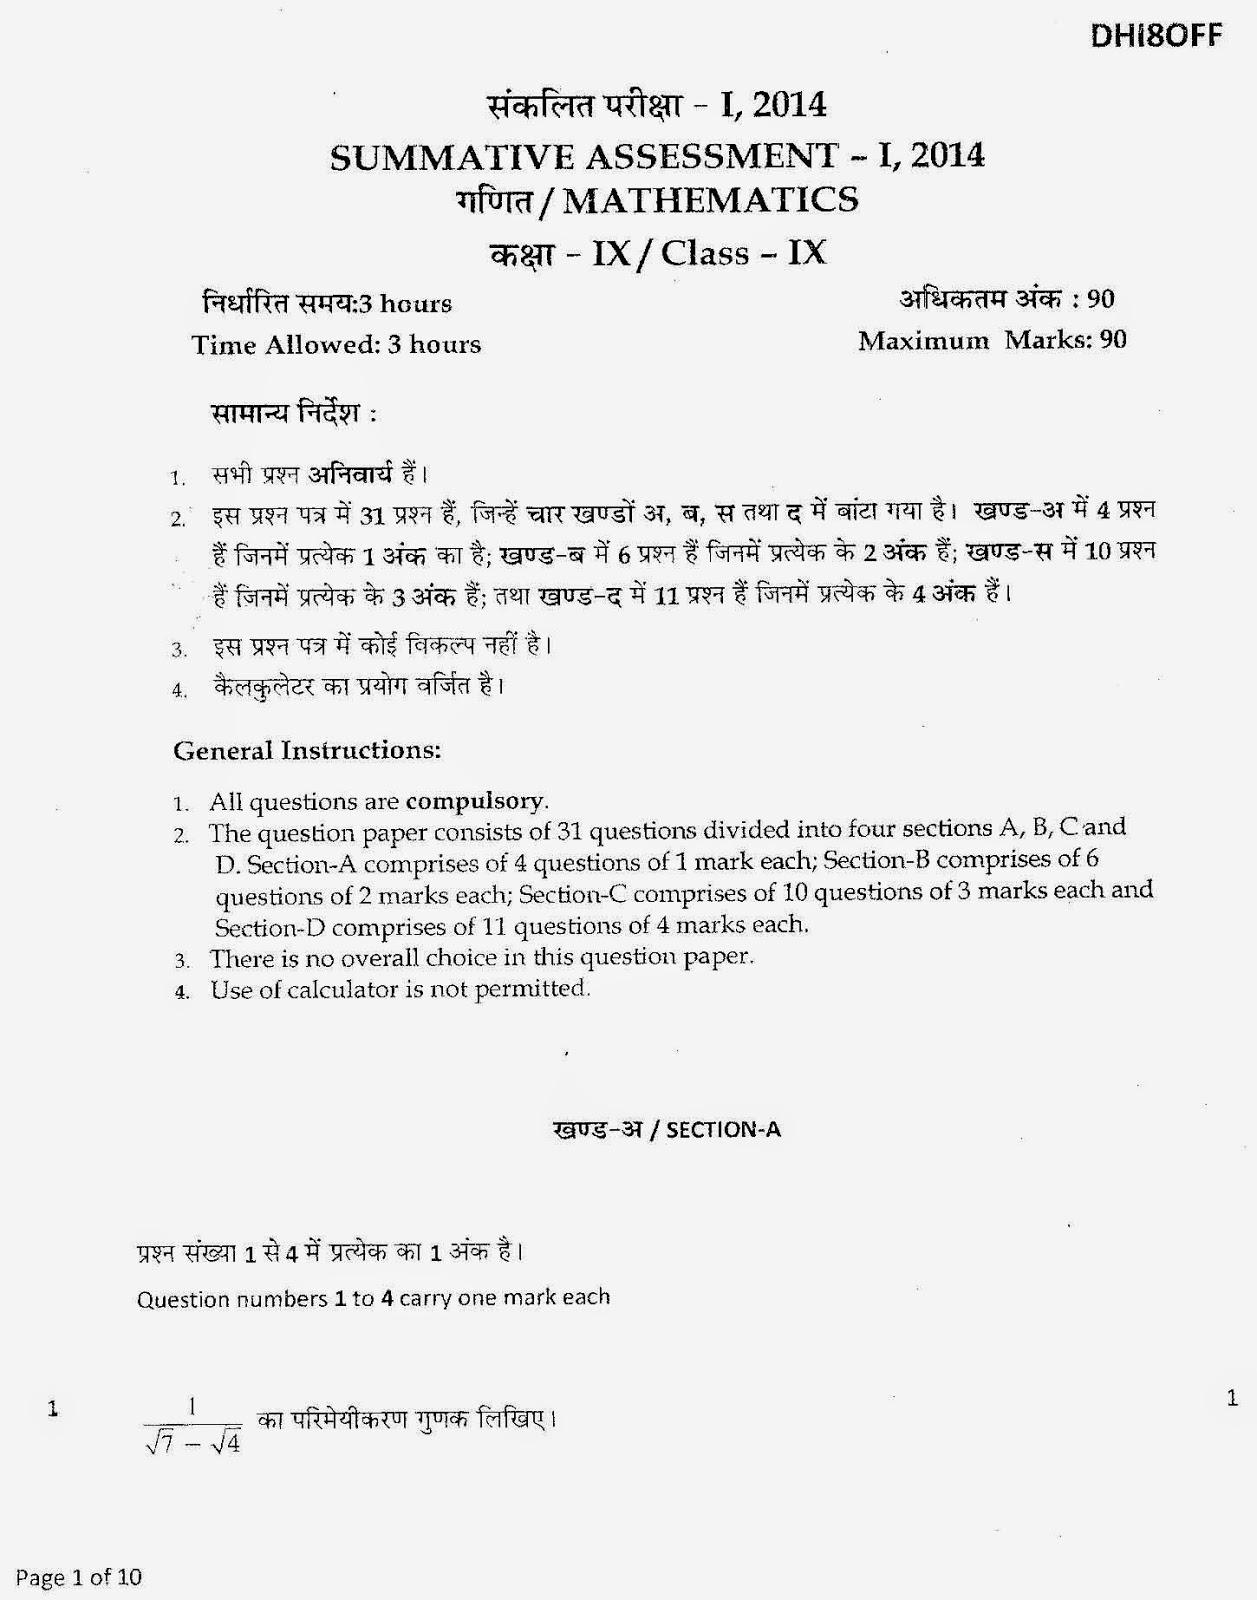 Class IX Don Bosco School Mathematics Question Paper SA 1 2014